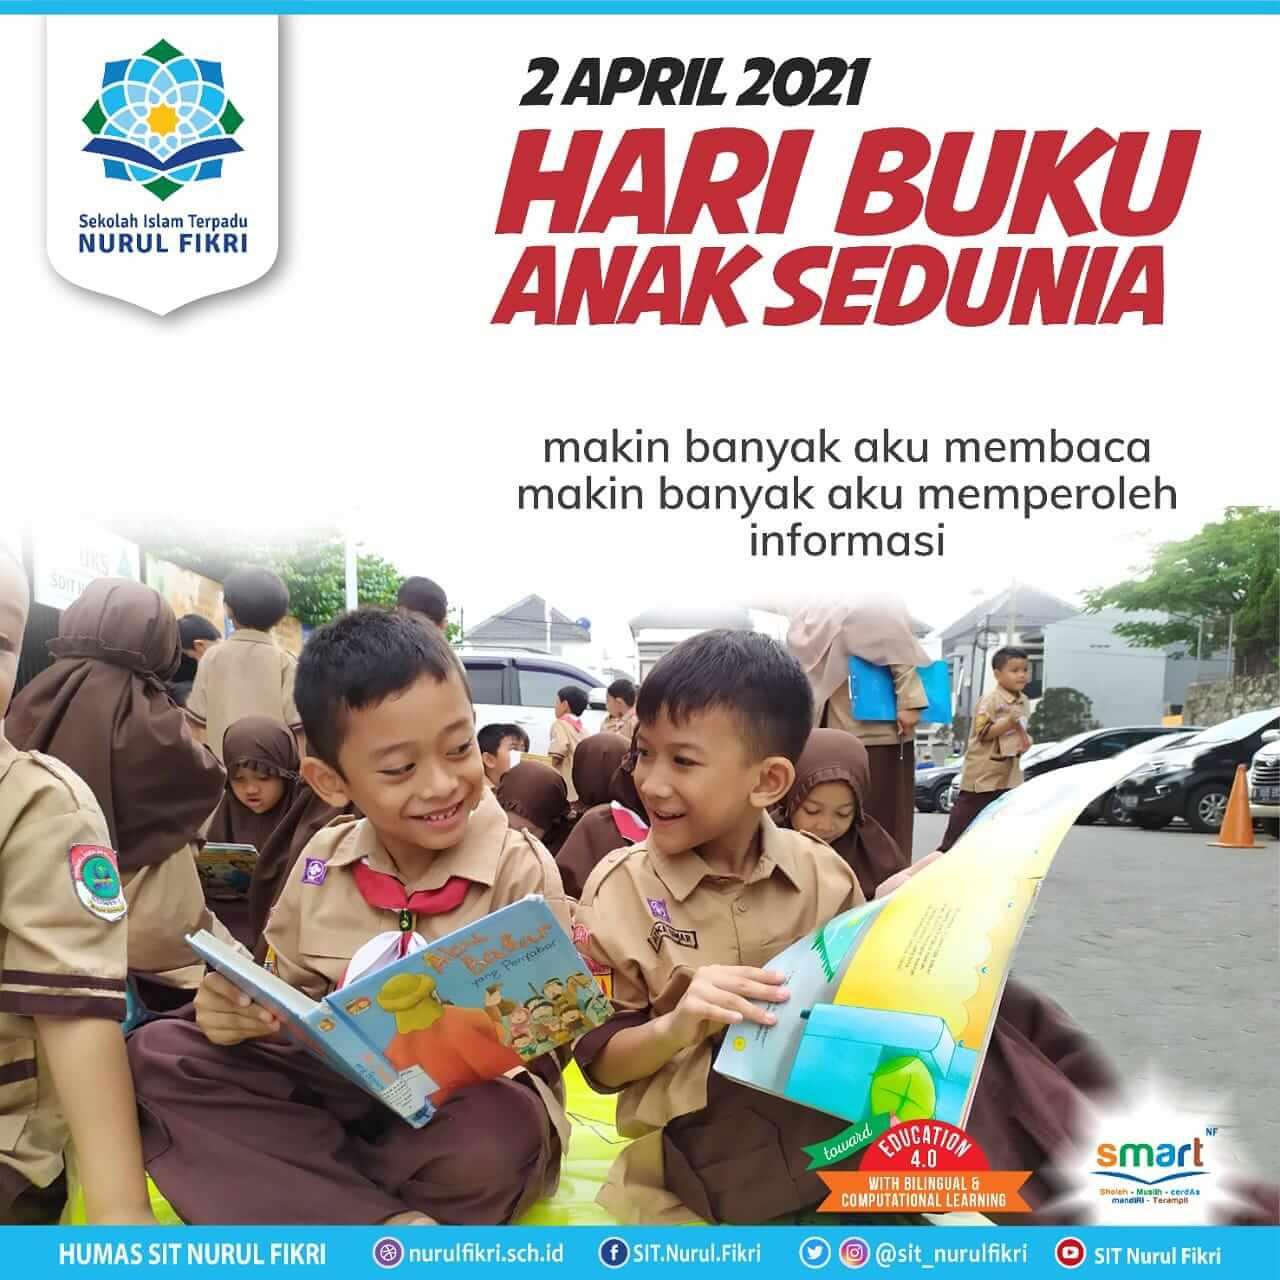 Selamat hari Buku Anak Sedunia